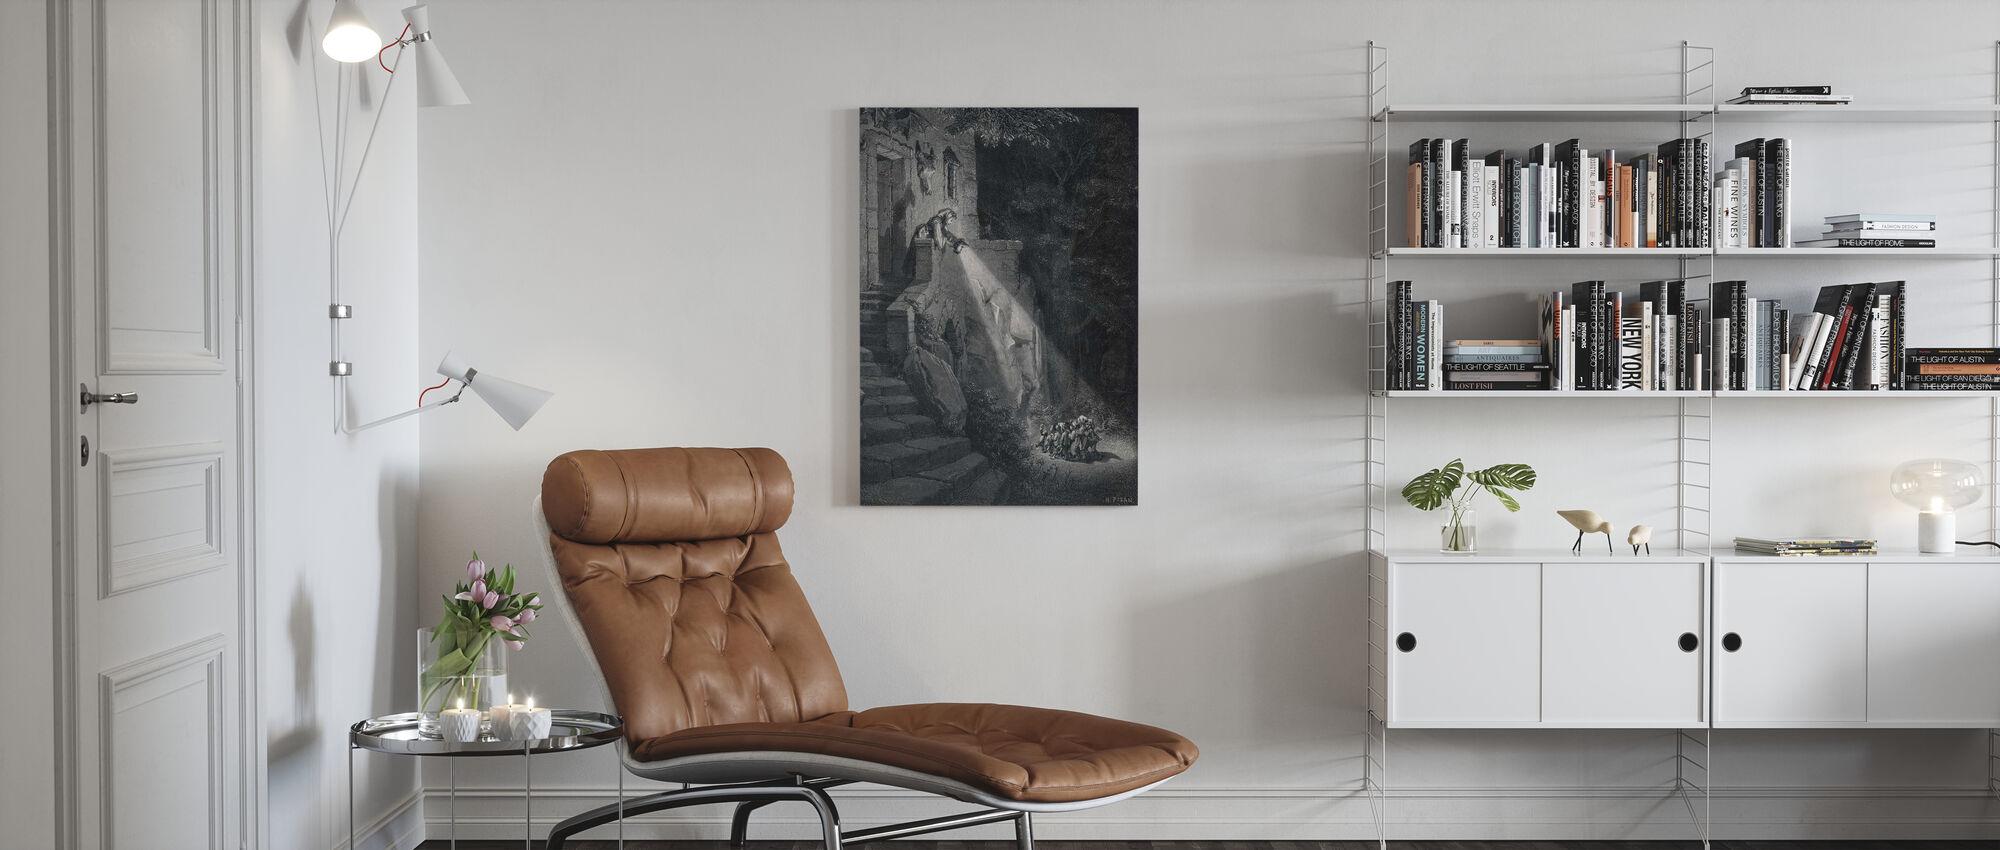 Gustave Dore - Ogre dans la forêt - Impression sur toile - Salle à manger